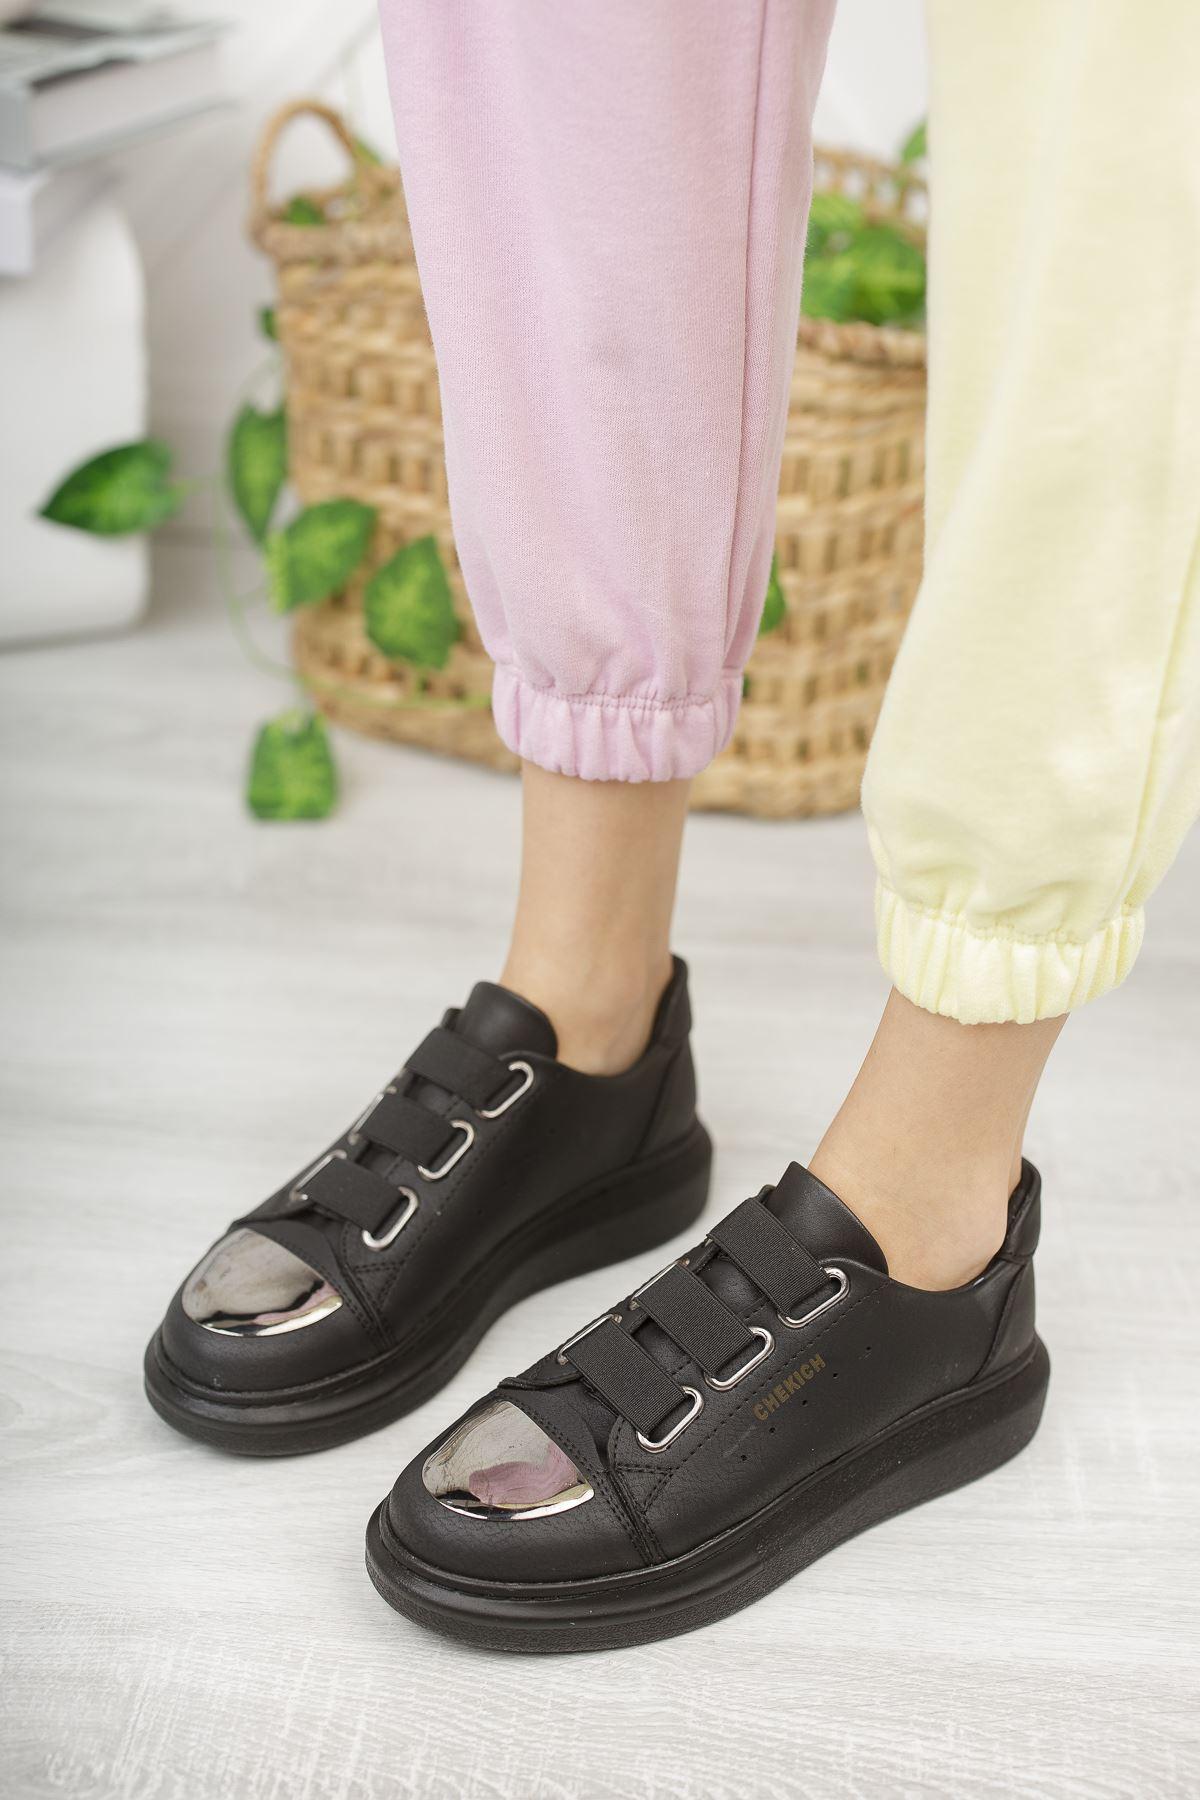 Chekich CH251 ST Kadın Ayakkabı SIYAH